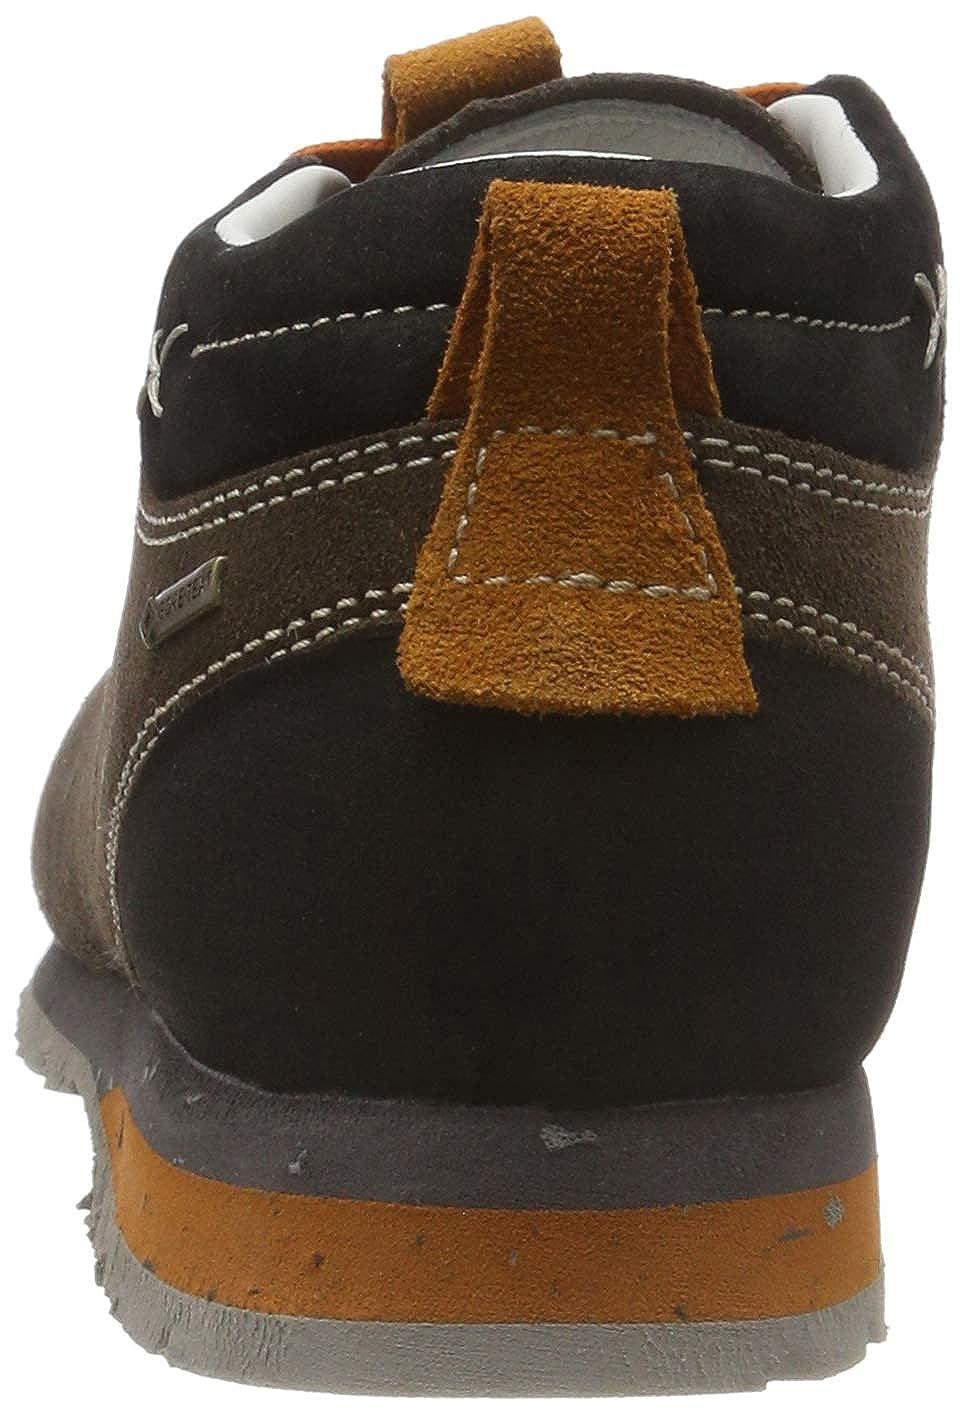 Chaussures de Randonn/ée Basses Homme AKU Bellamont 2 Suede GT